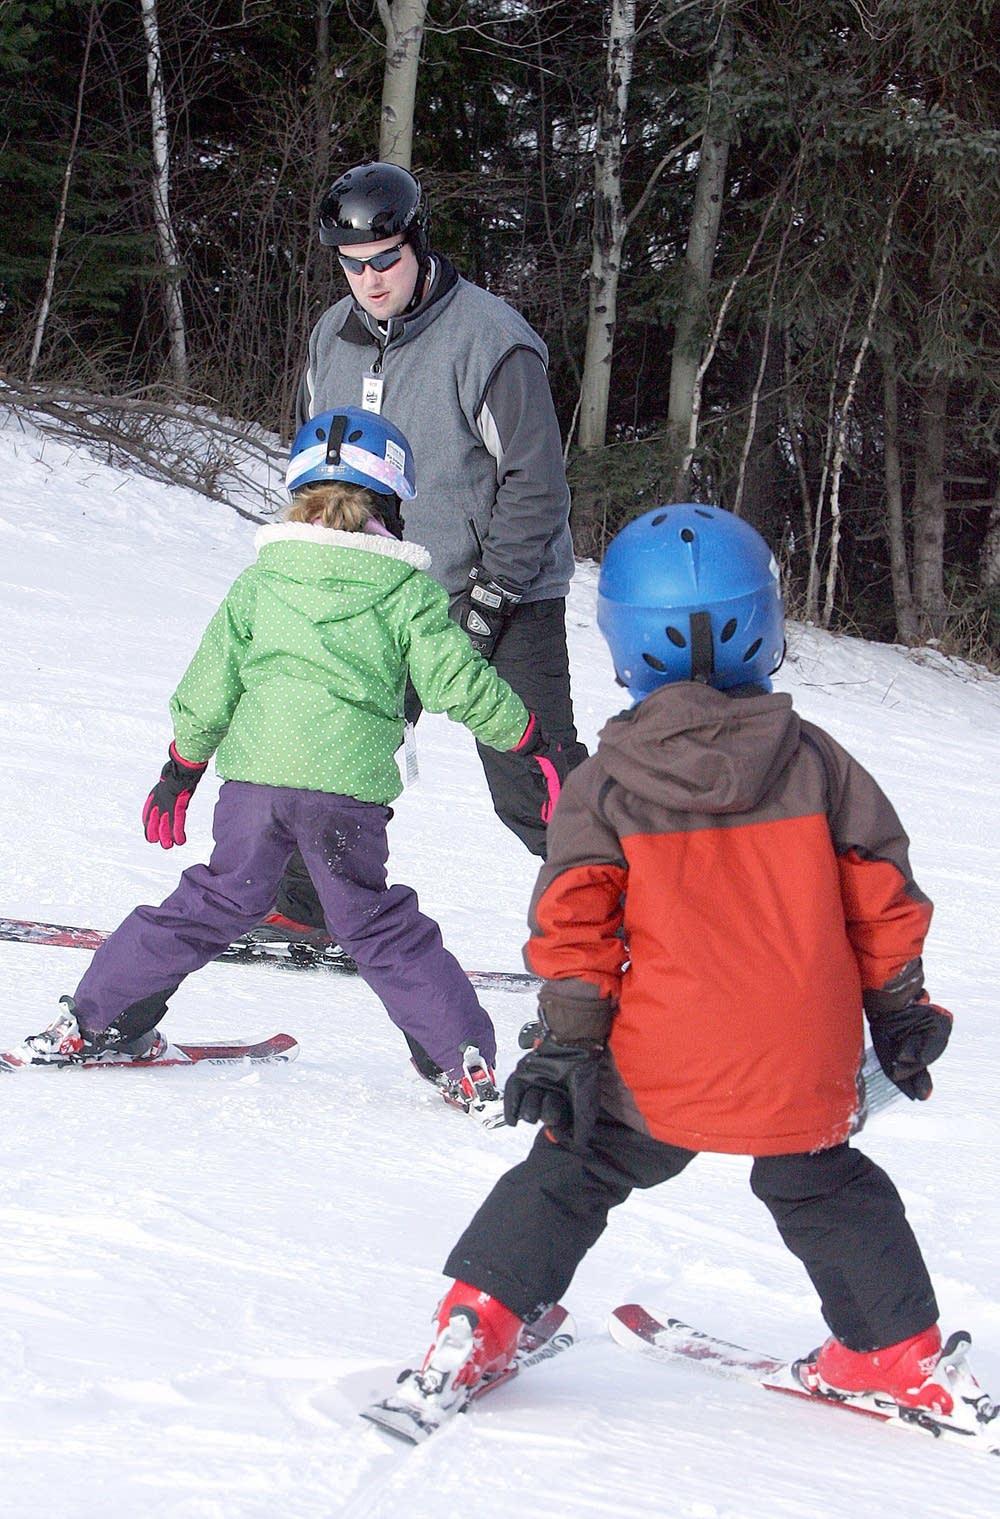 Wearing ski helmets